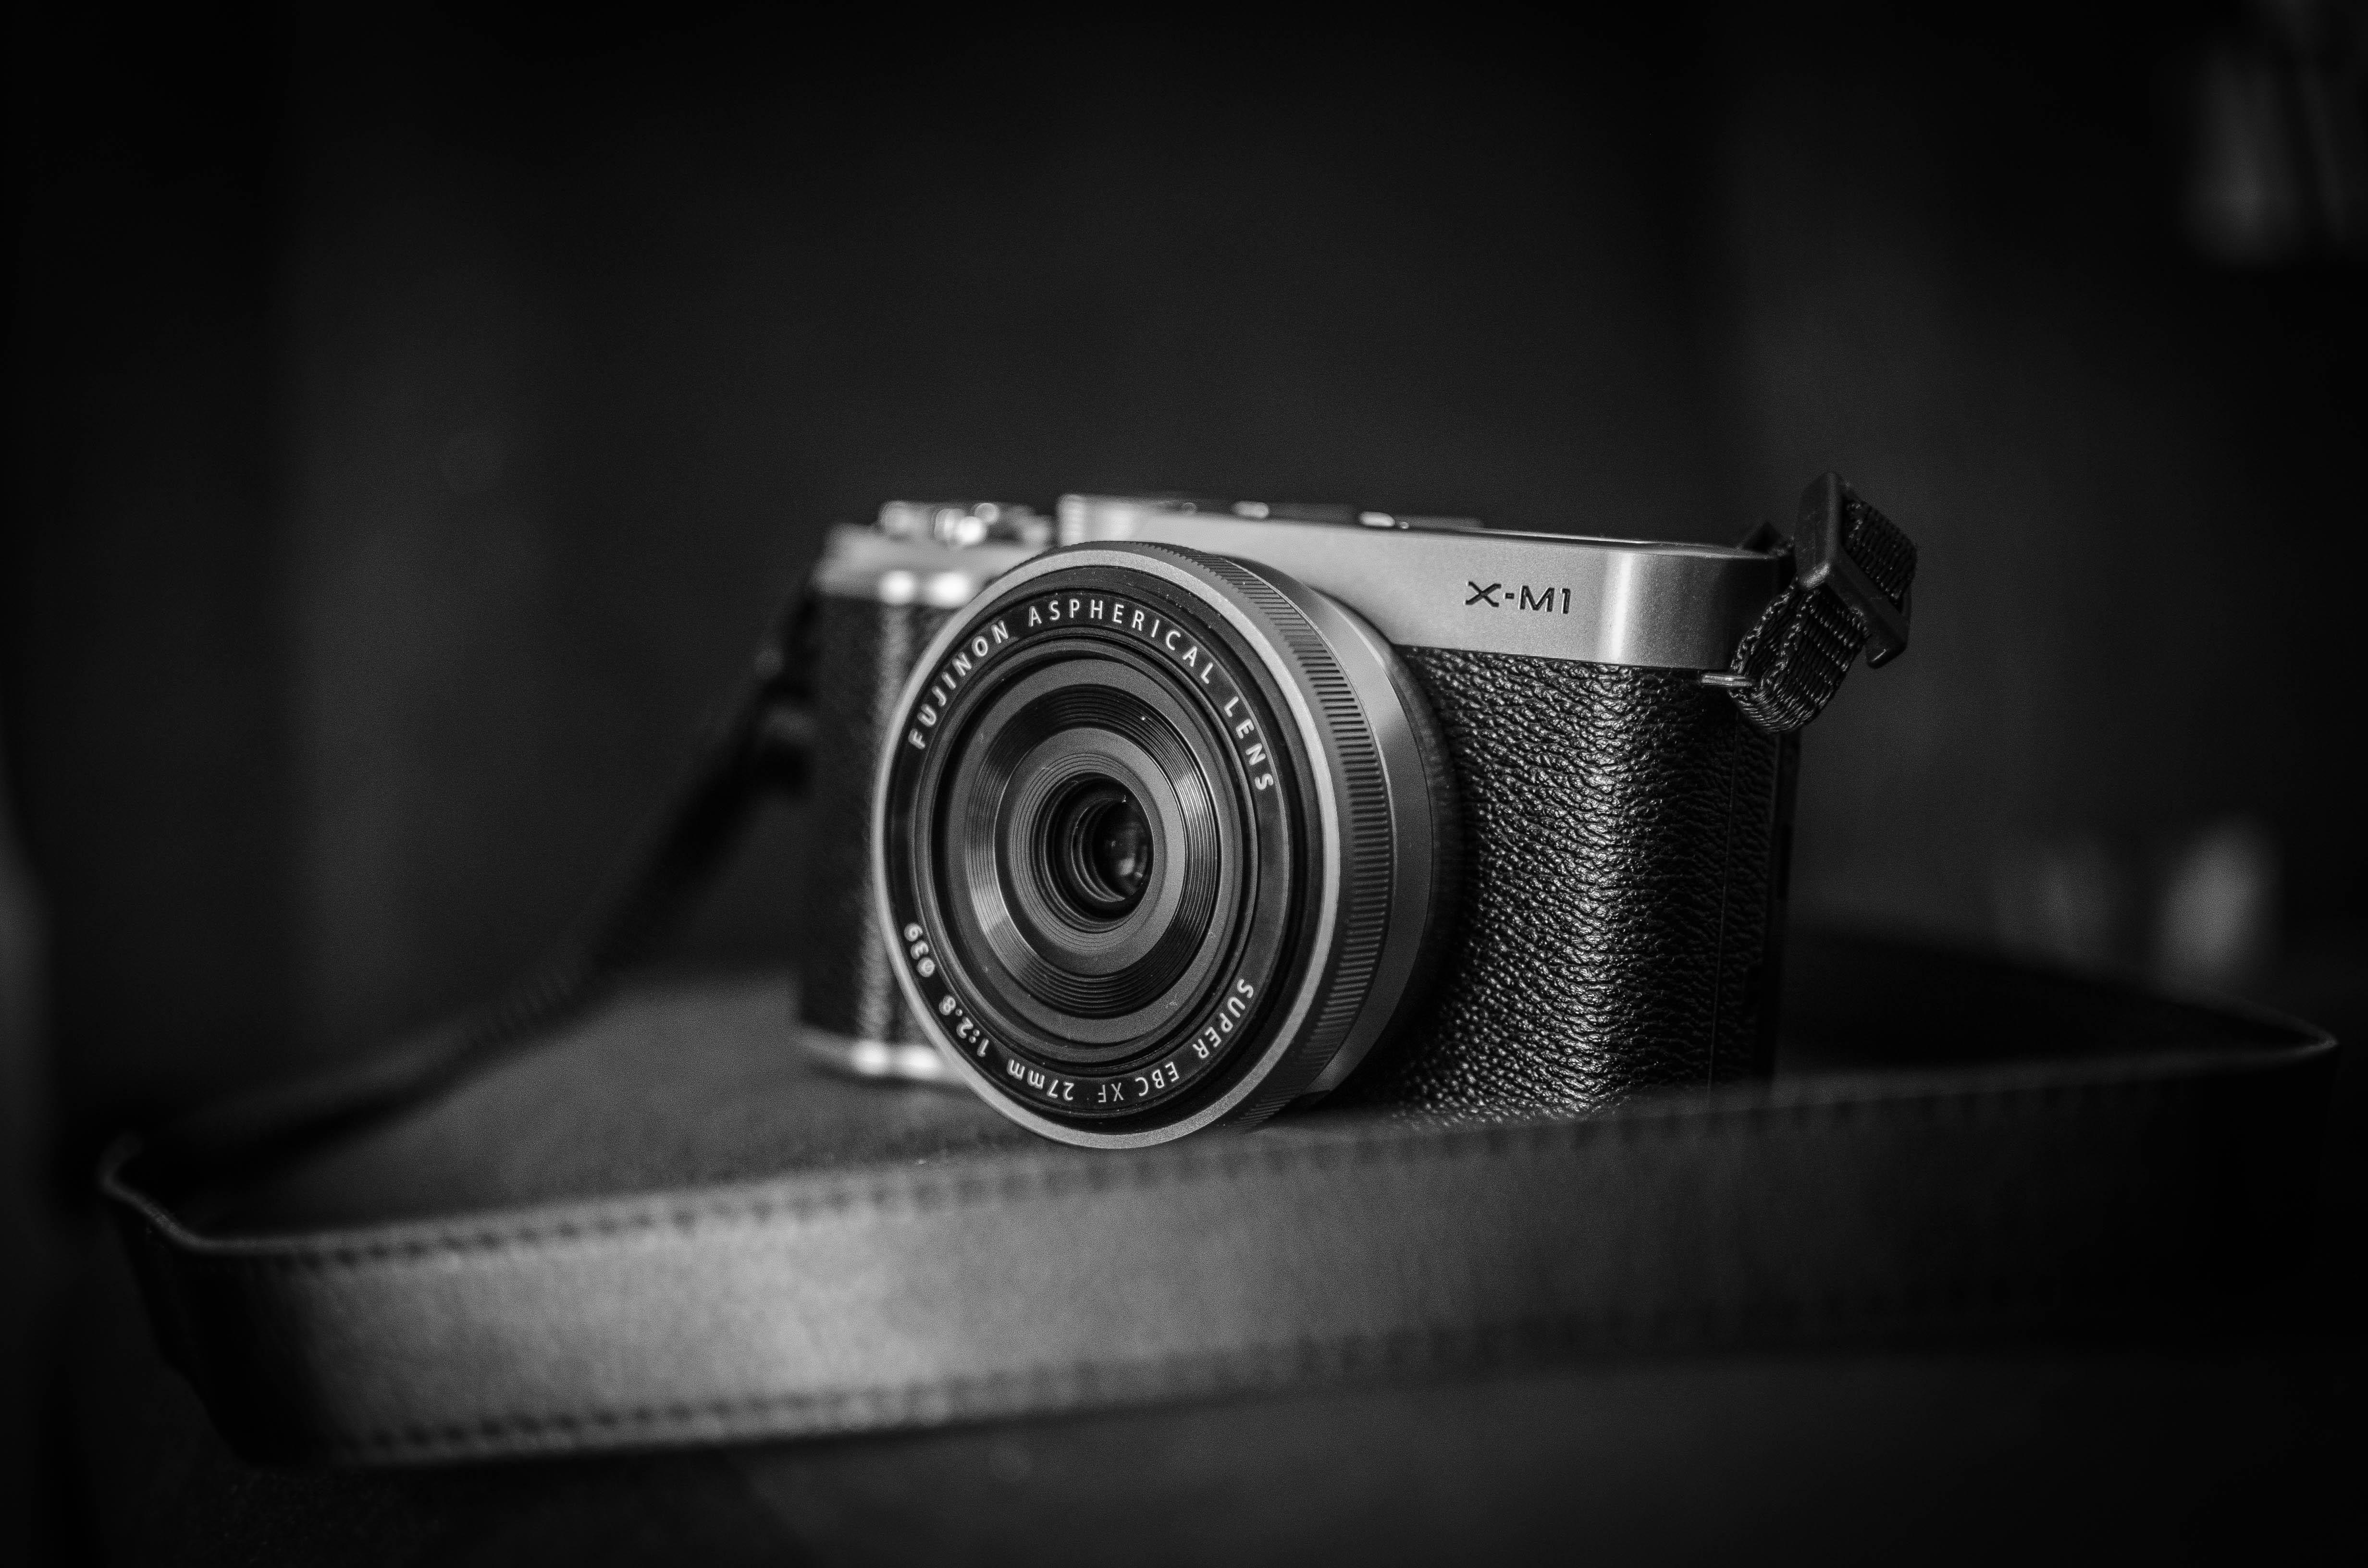 Black and white camera photography photographer lens black monochrome reflex camera digital camera camera lens monochrome